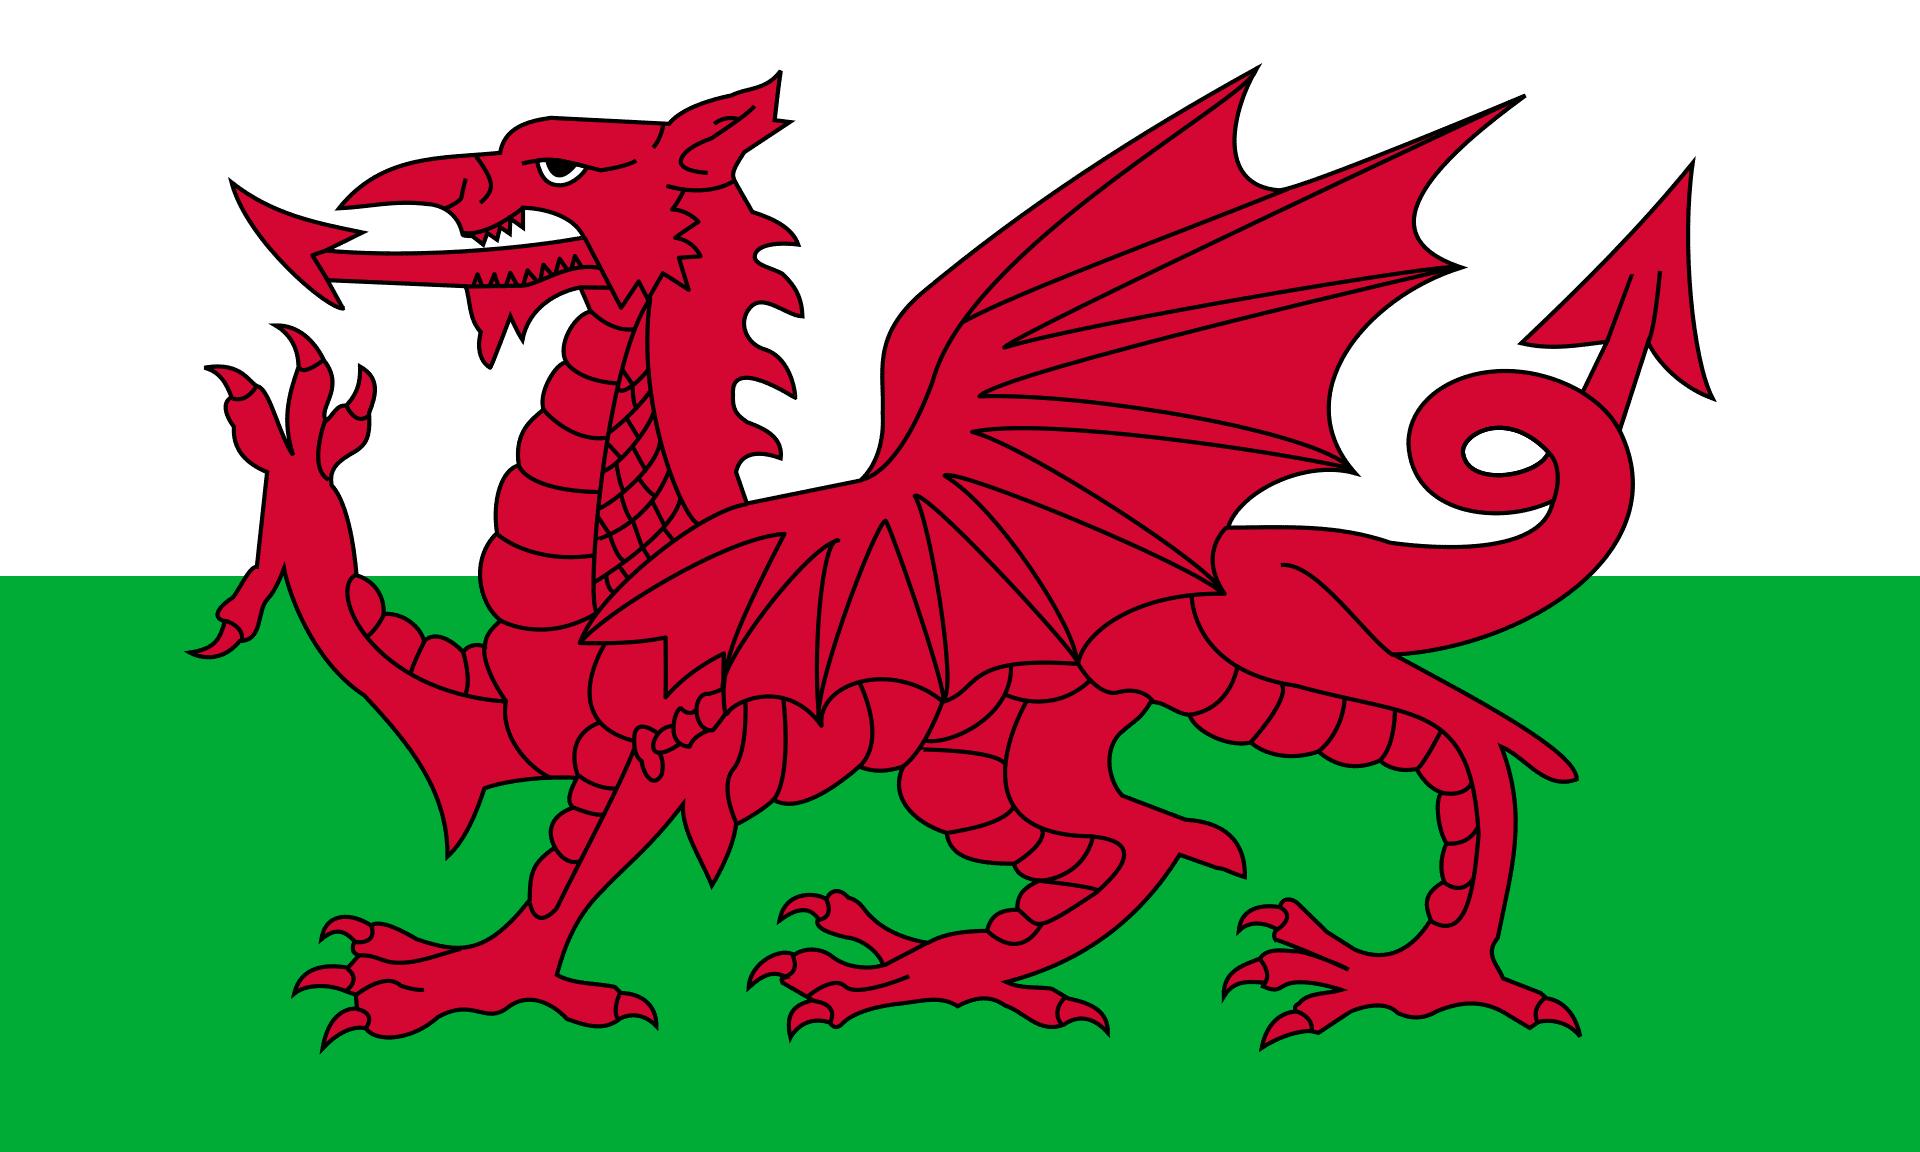 Club Rugby Galles